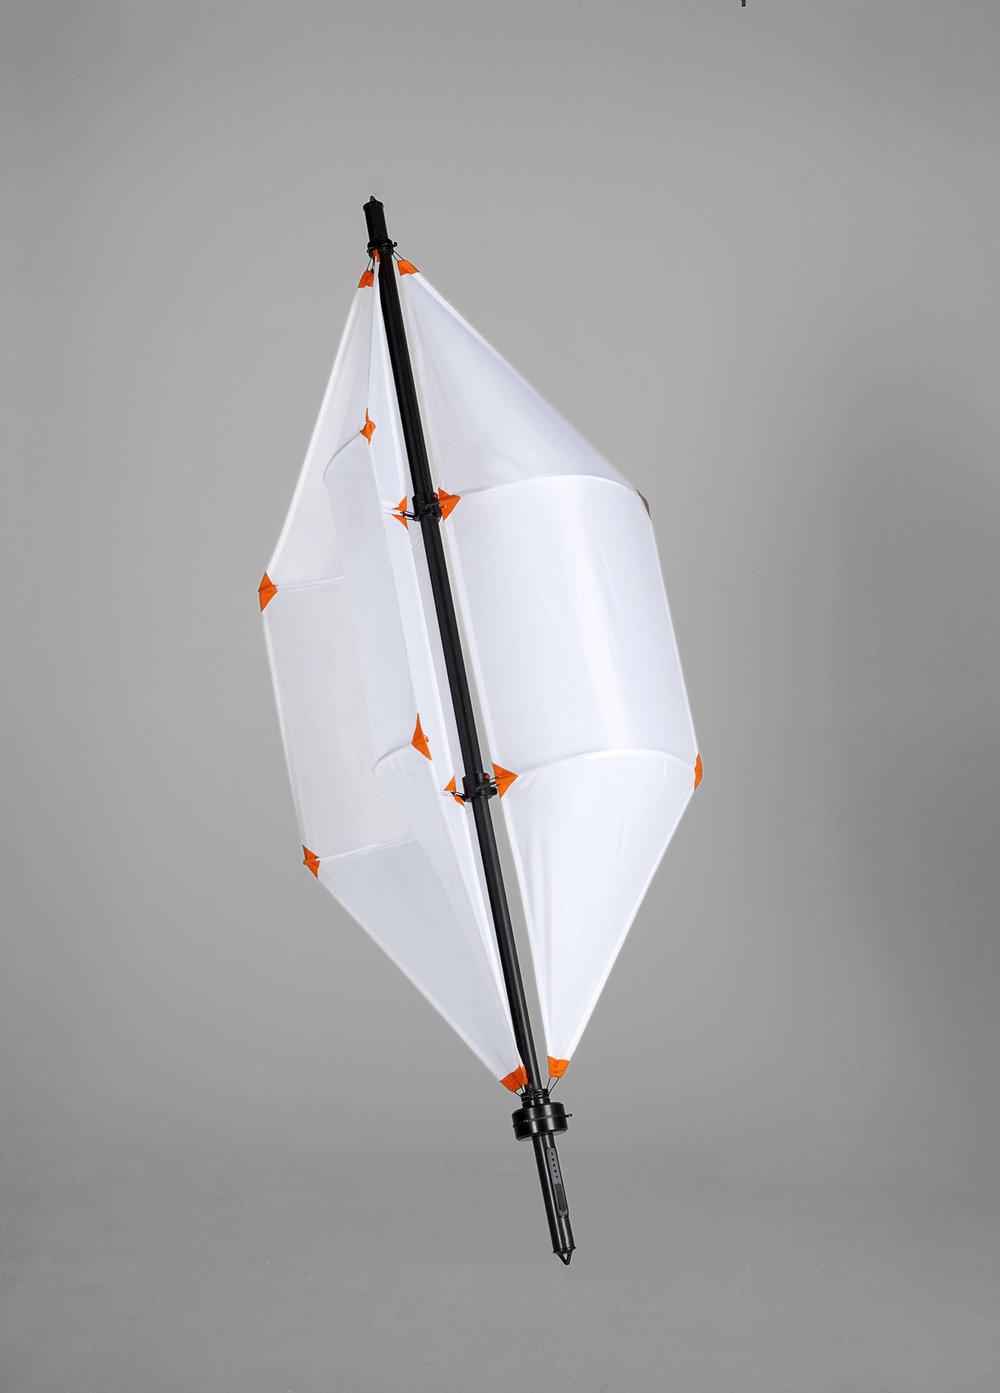 micro-wind-turbine-09.jpg